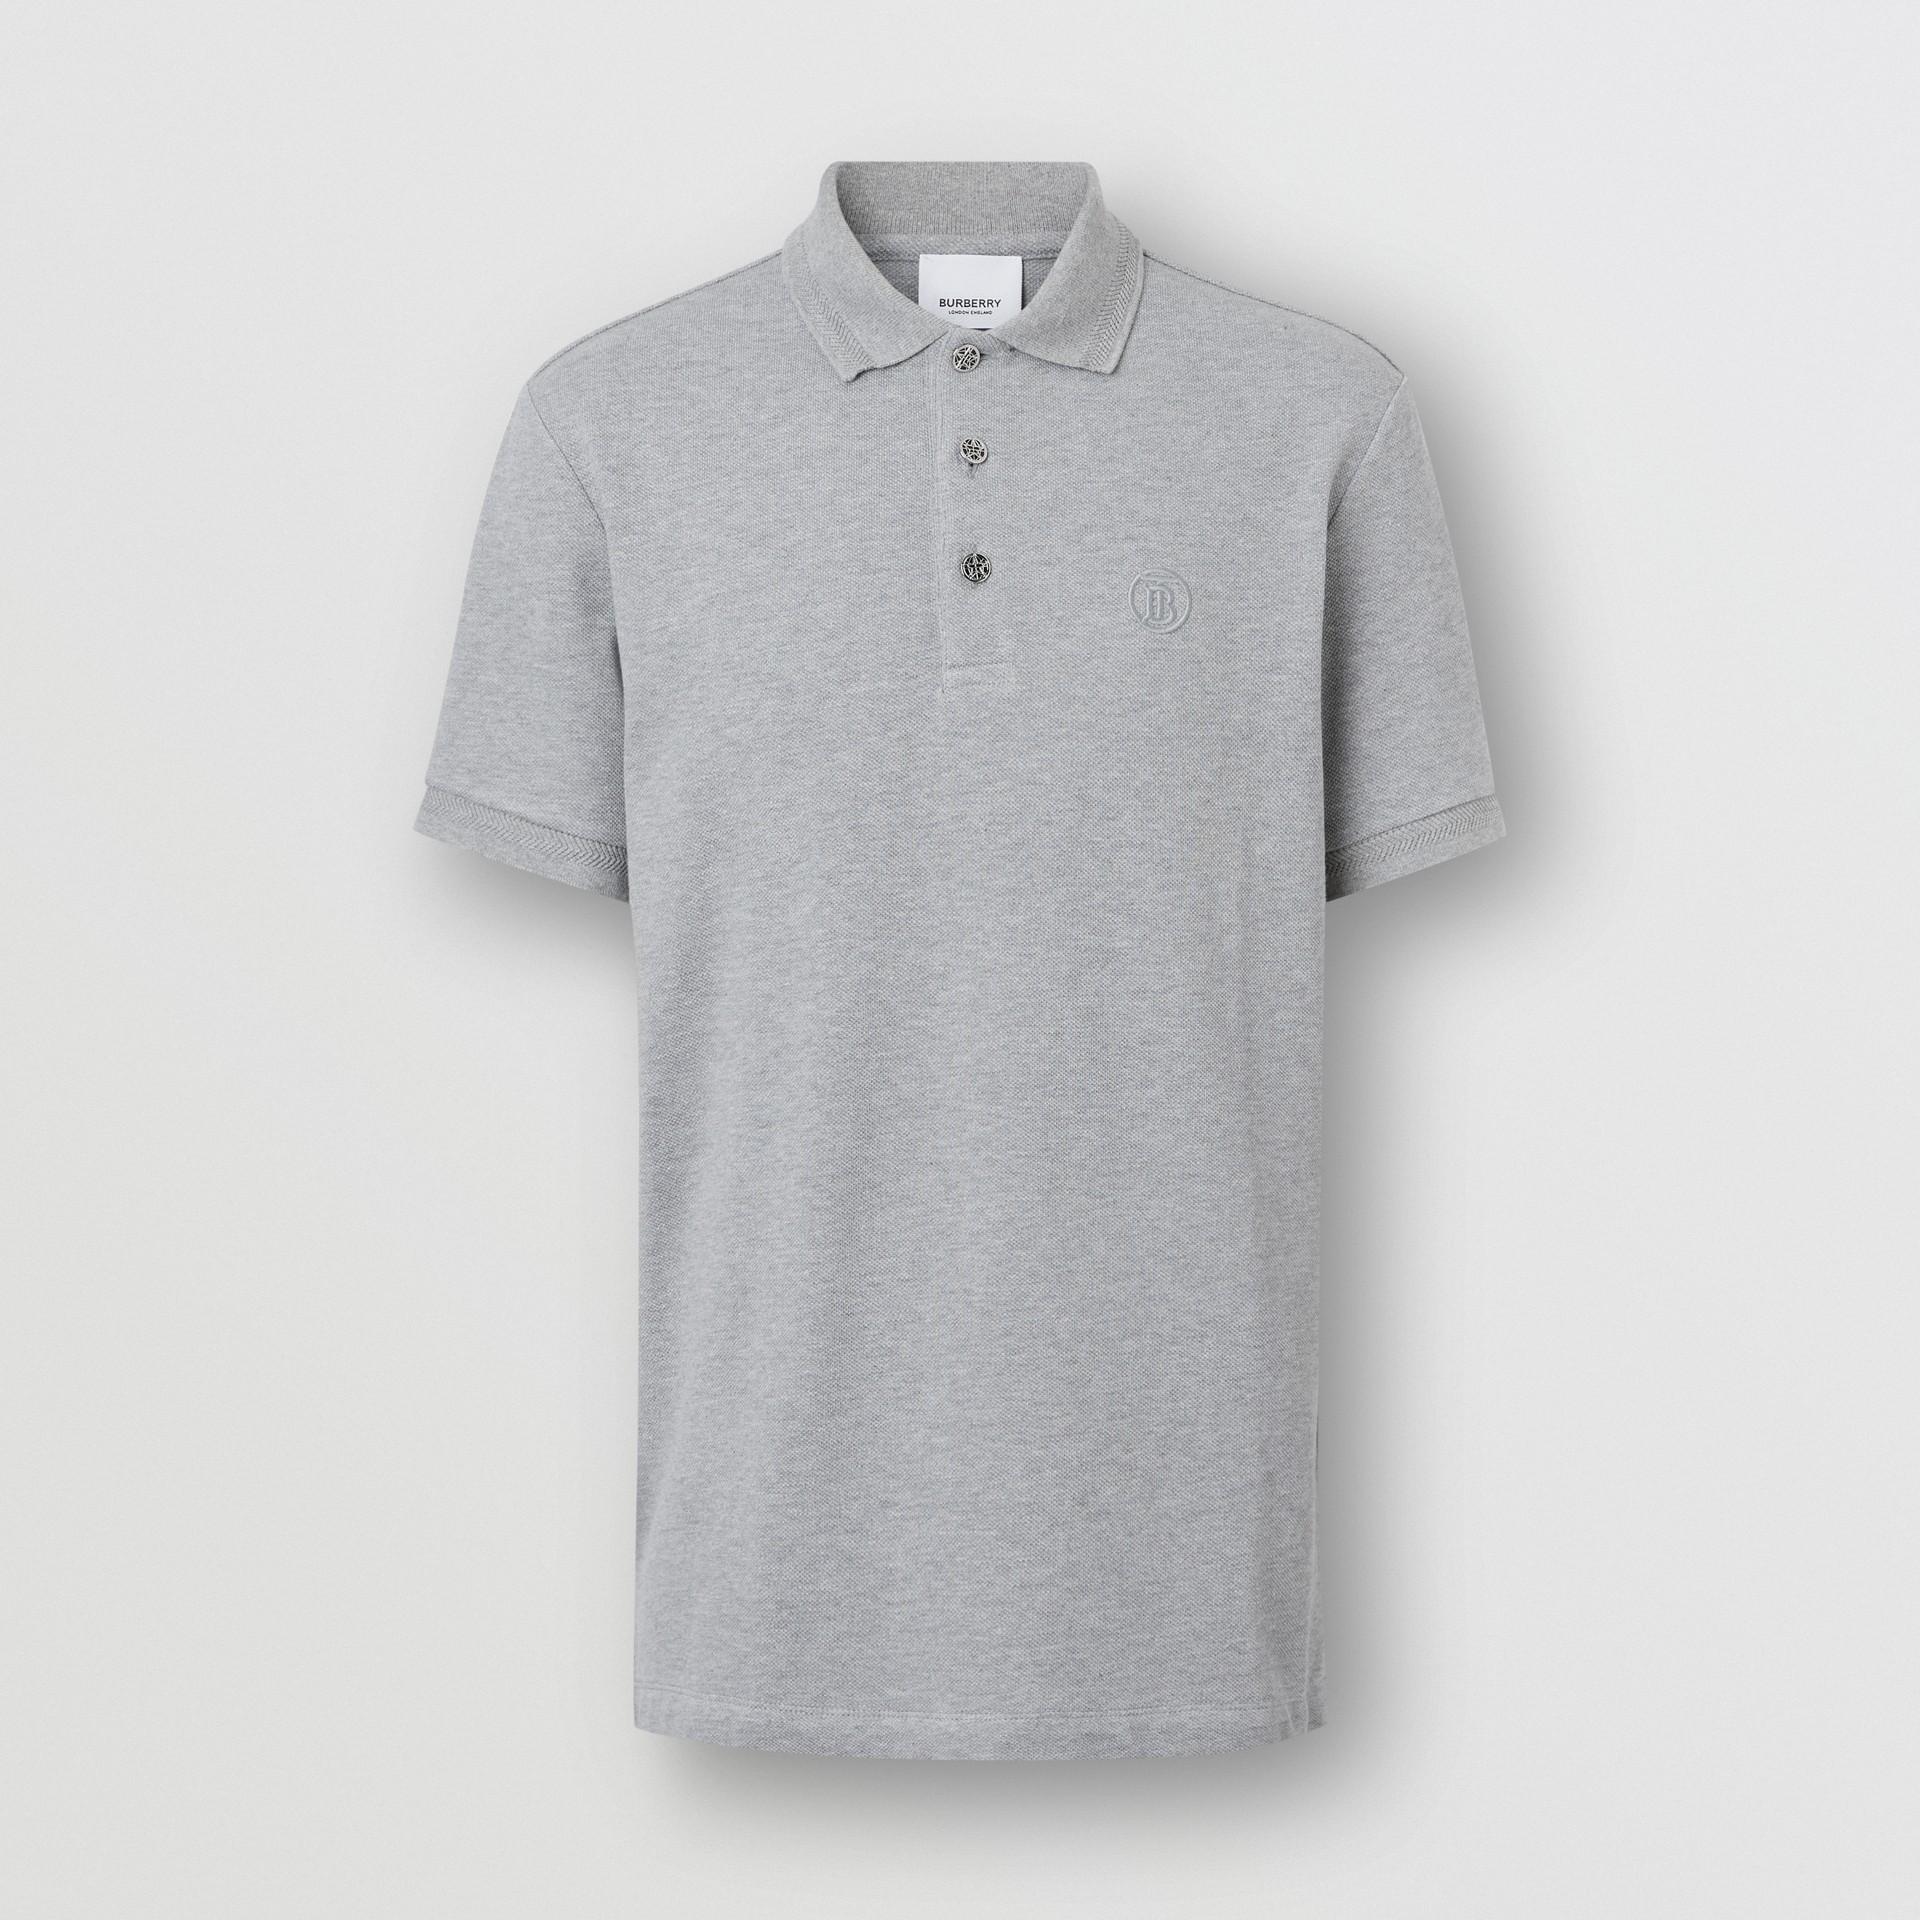 Button Detail Cotton Piqué Polo Shirt in Pale Grey Melange - Men | Burberry - gallery image 3